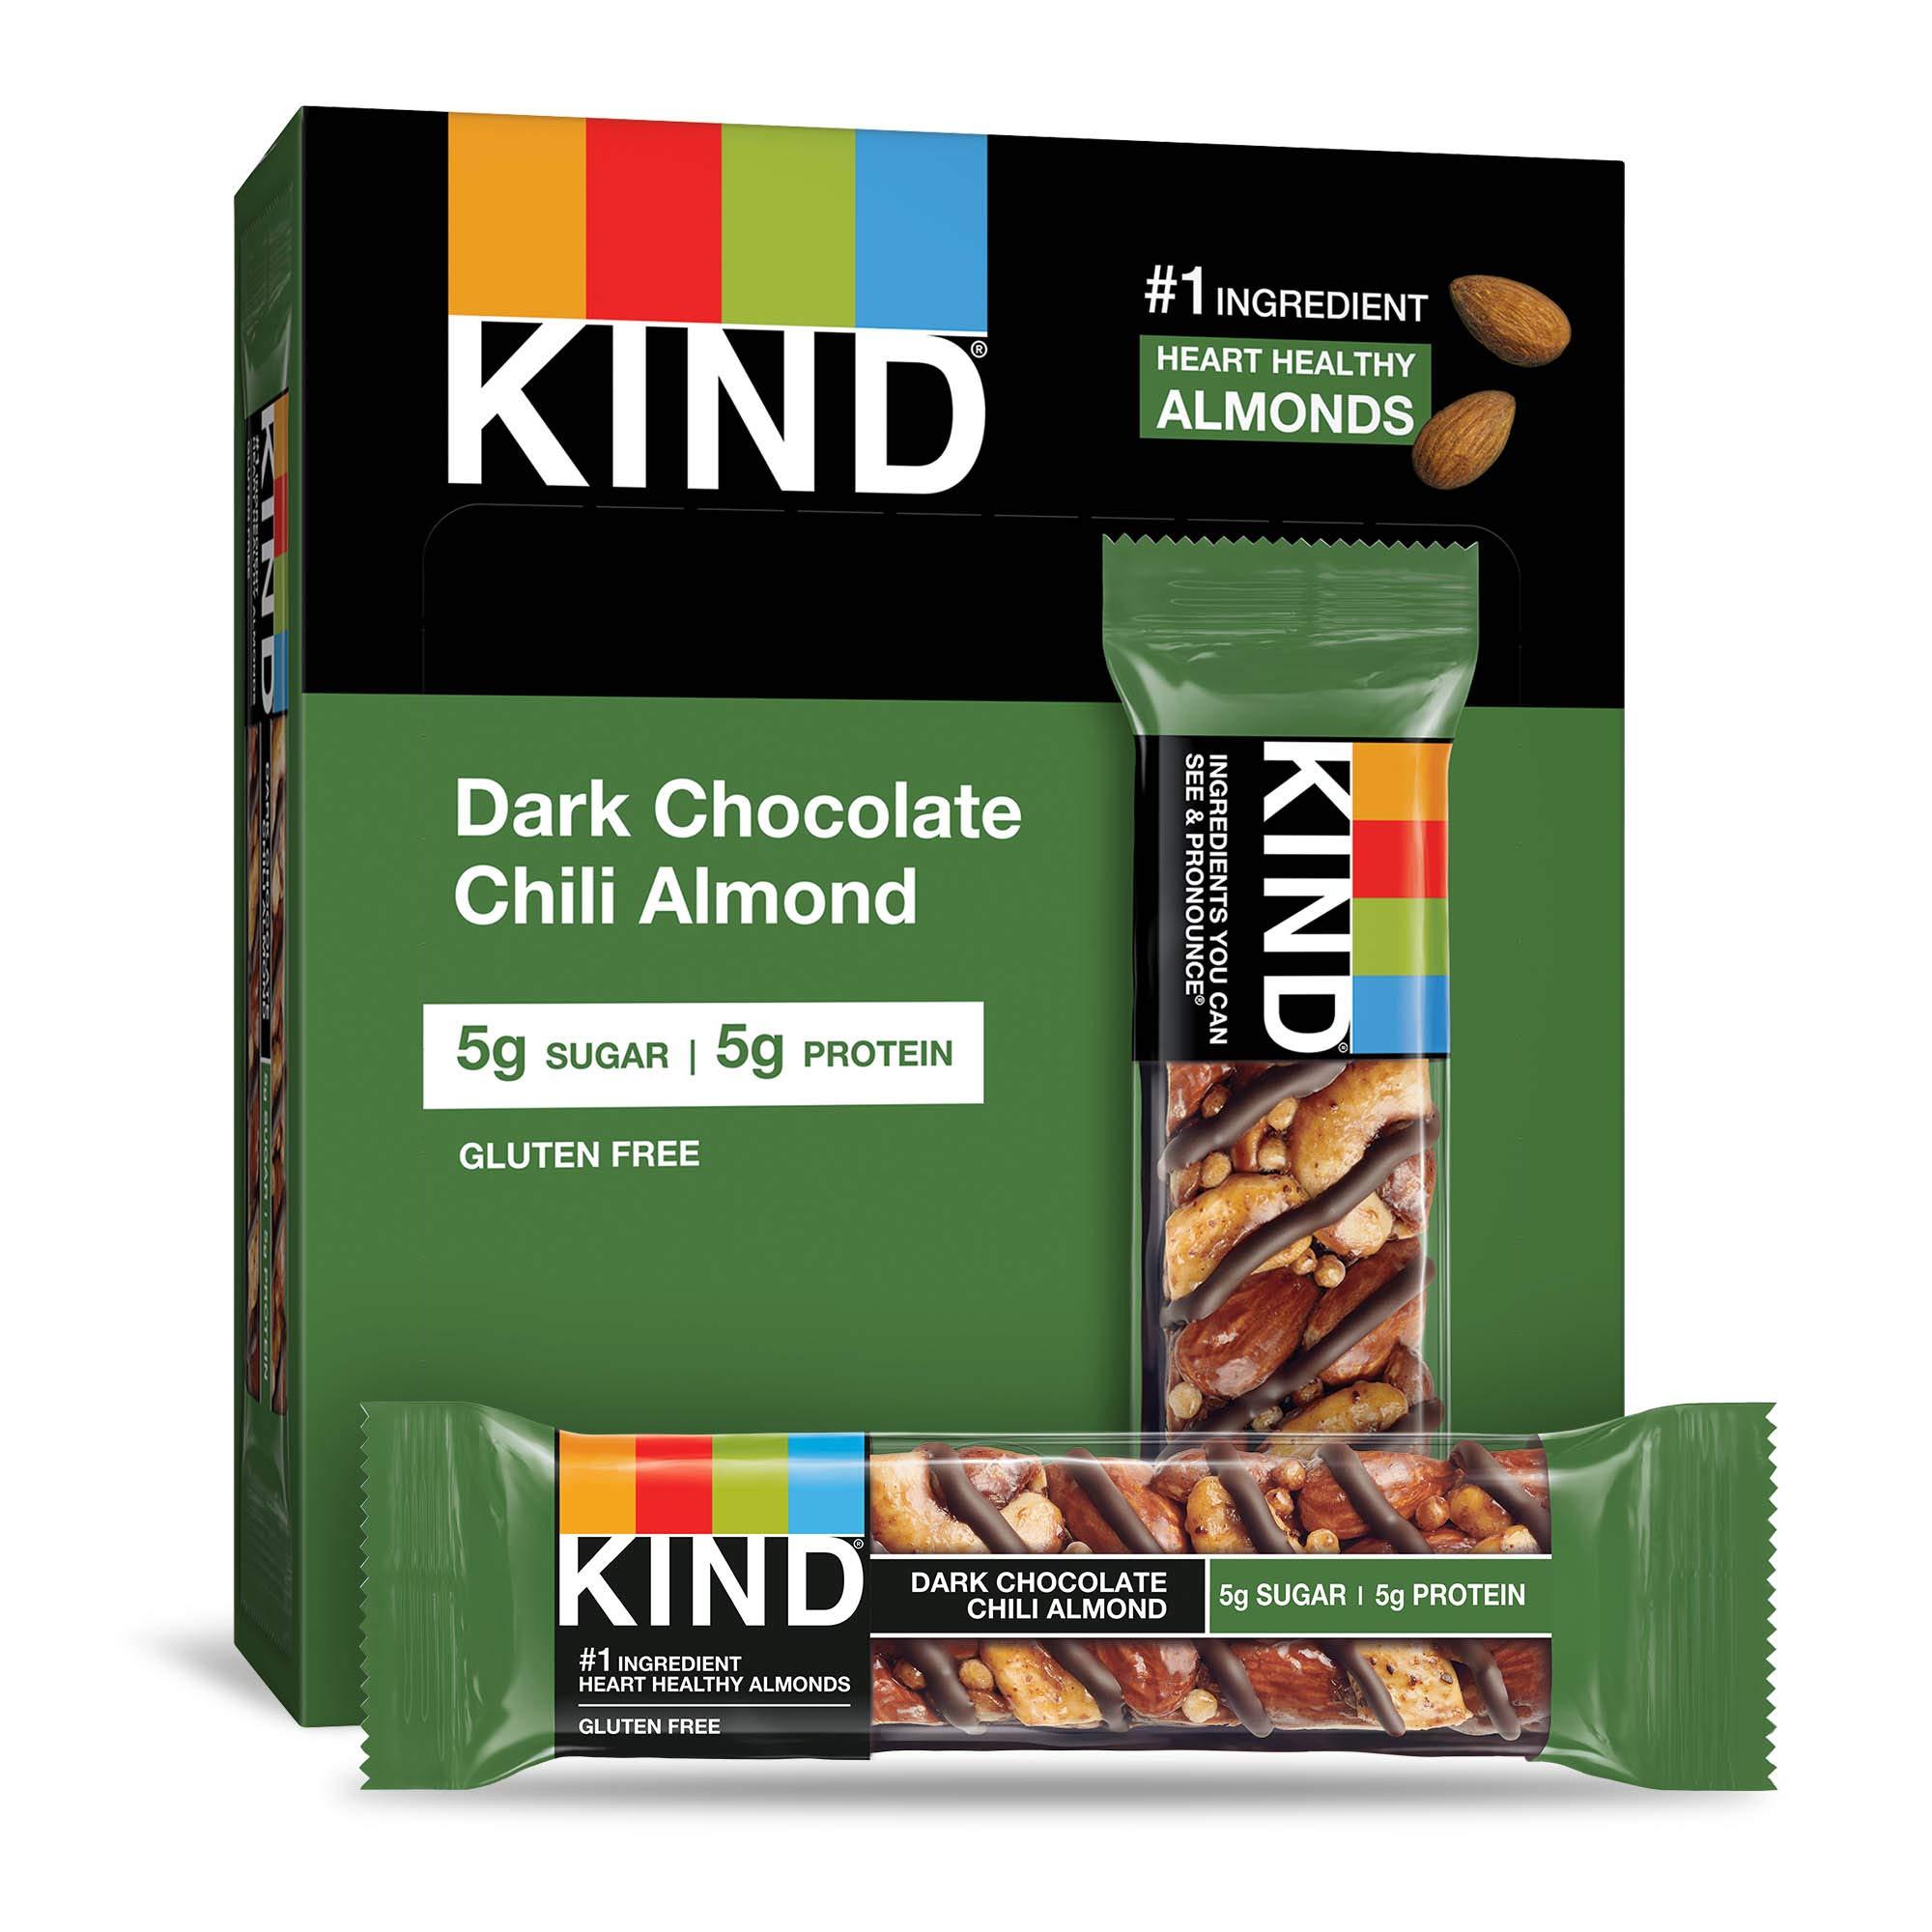 KIND Bars, Dark Chocolate Chili Almond, Gluten Free, Low Sugar, 1.4oz, 12 Count by KIND